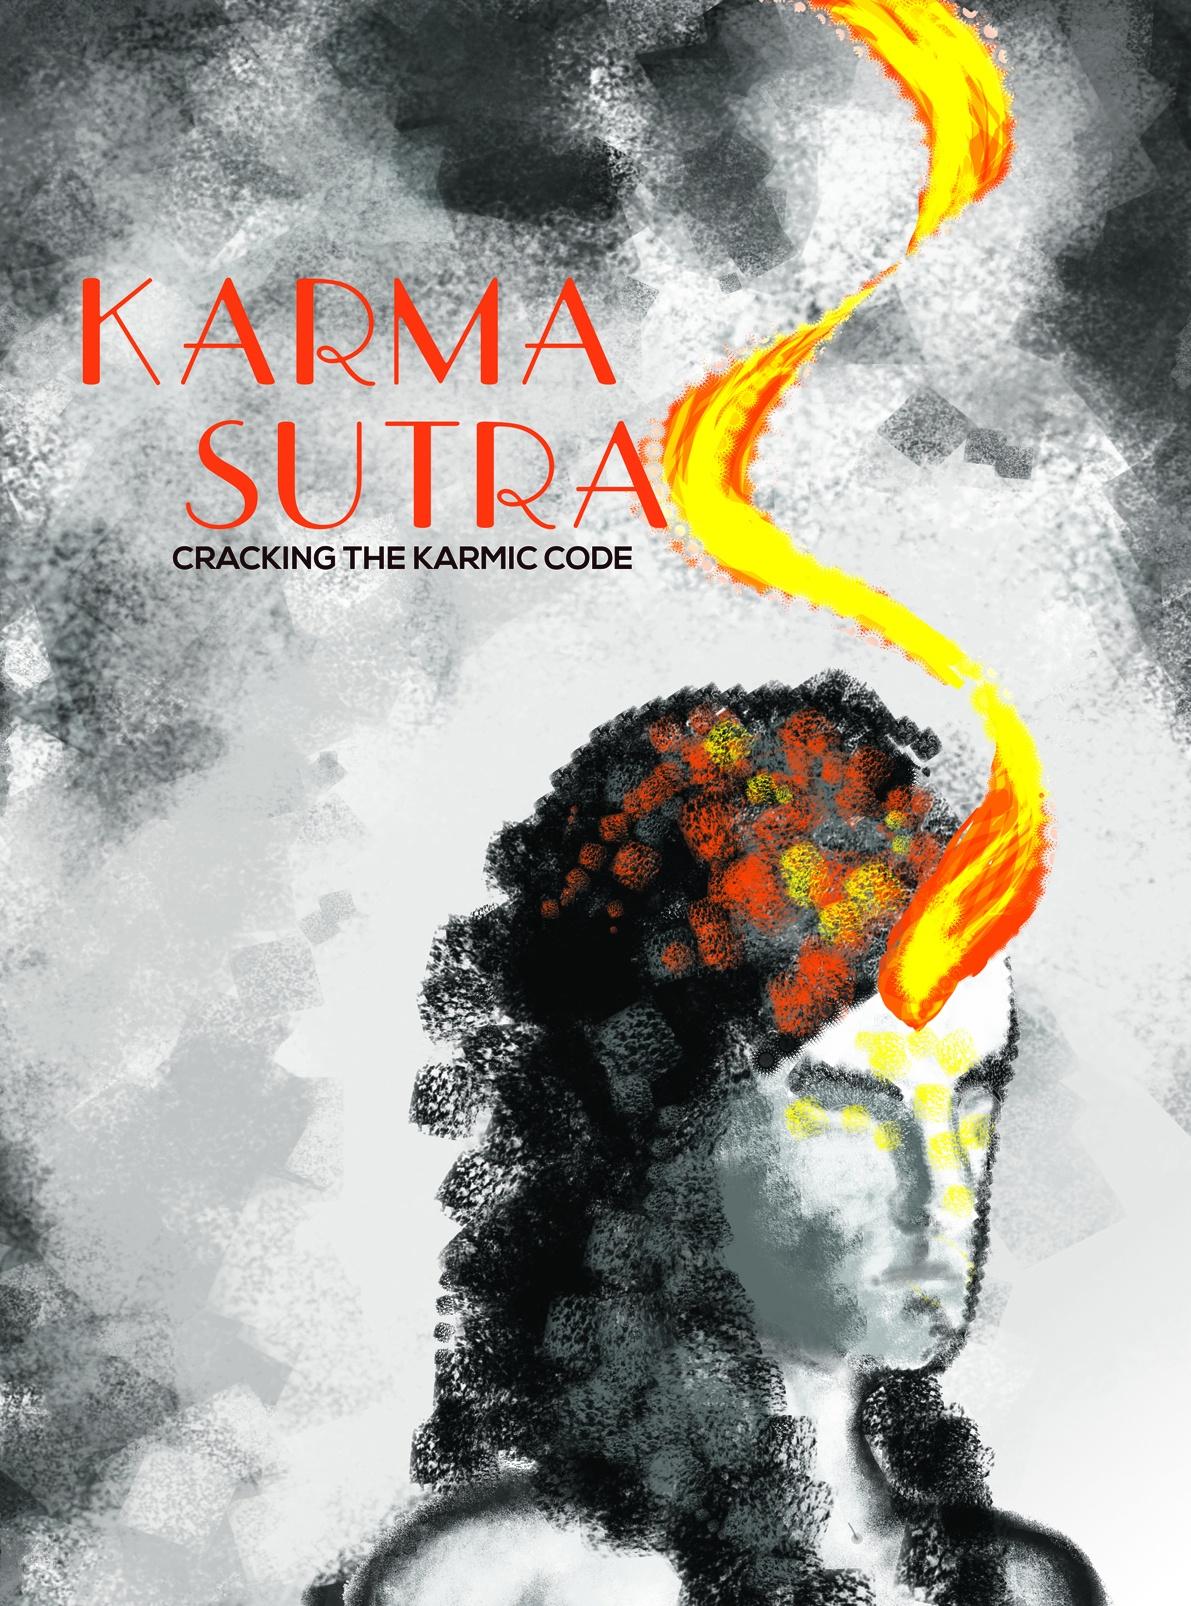 Smashwords karma sutra cracking the karmic code a book by karma sutra cracking the karmic code fandeluxe Gallery